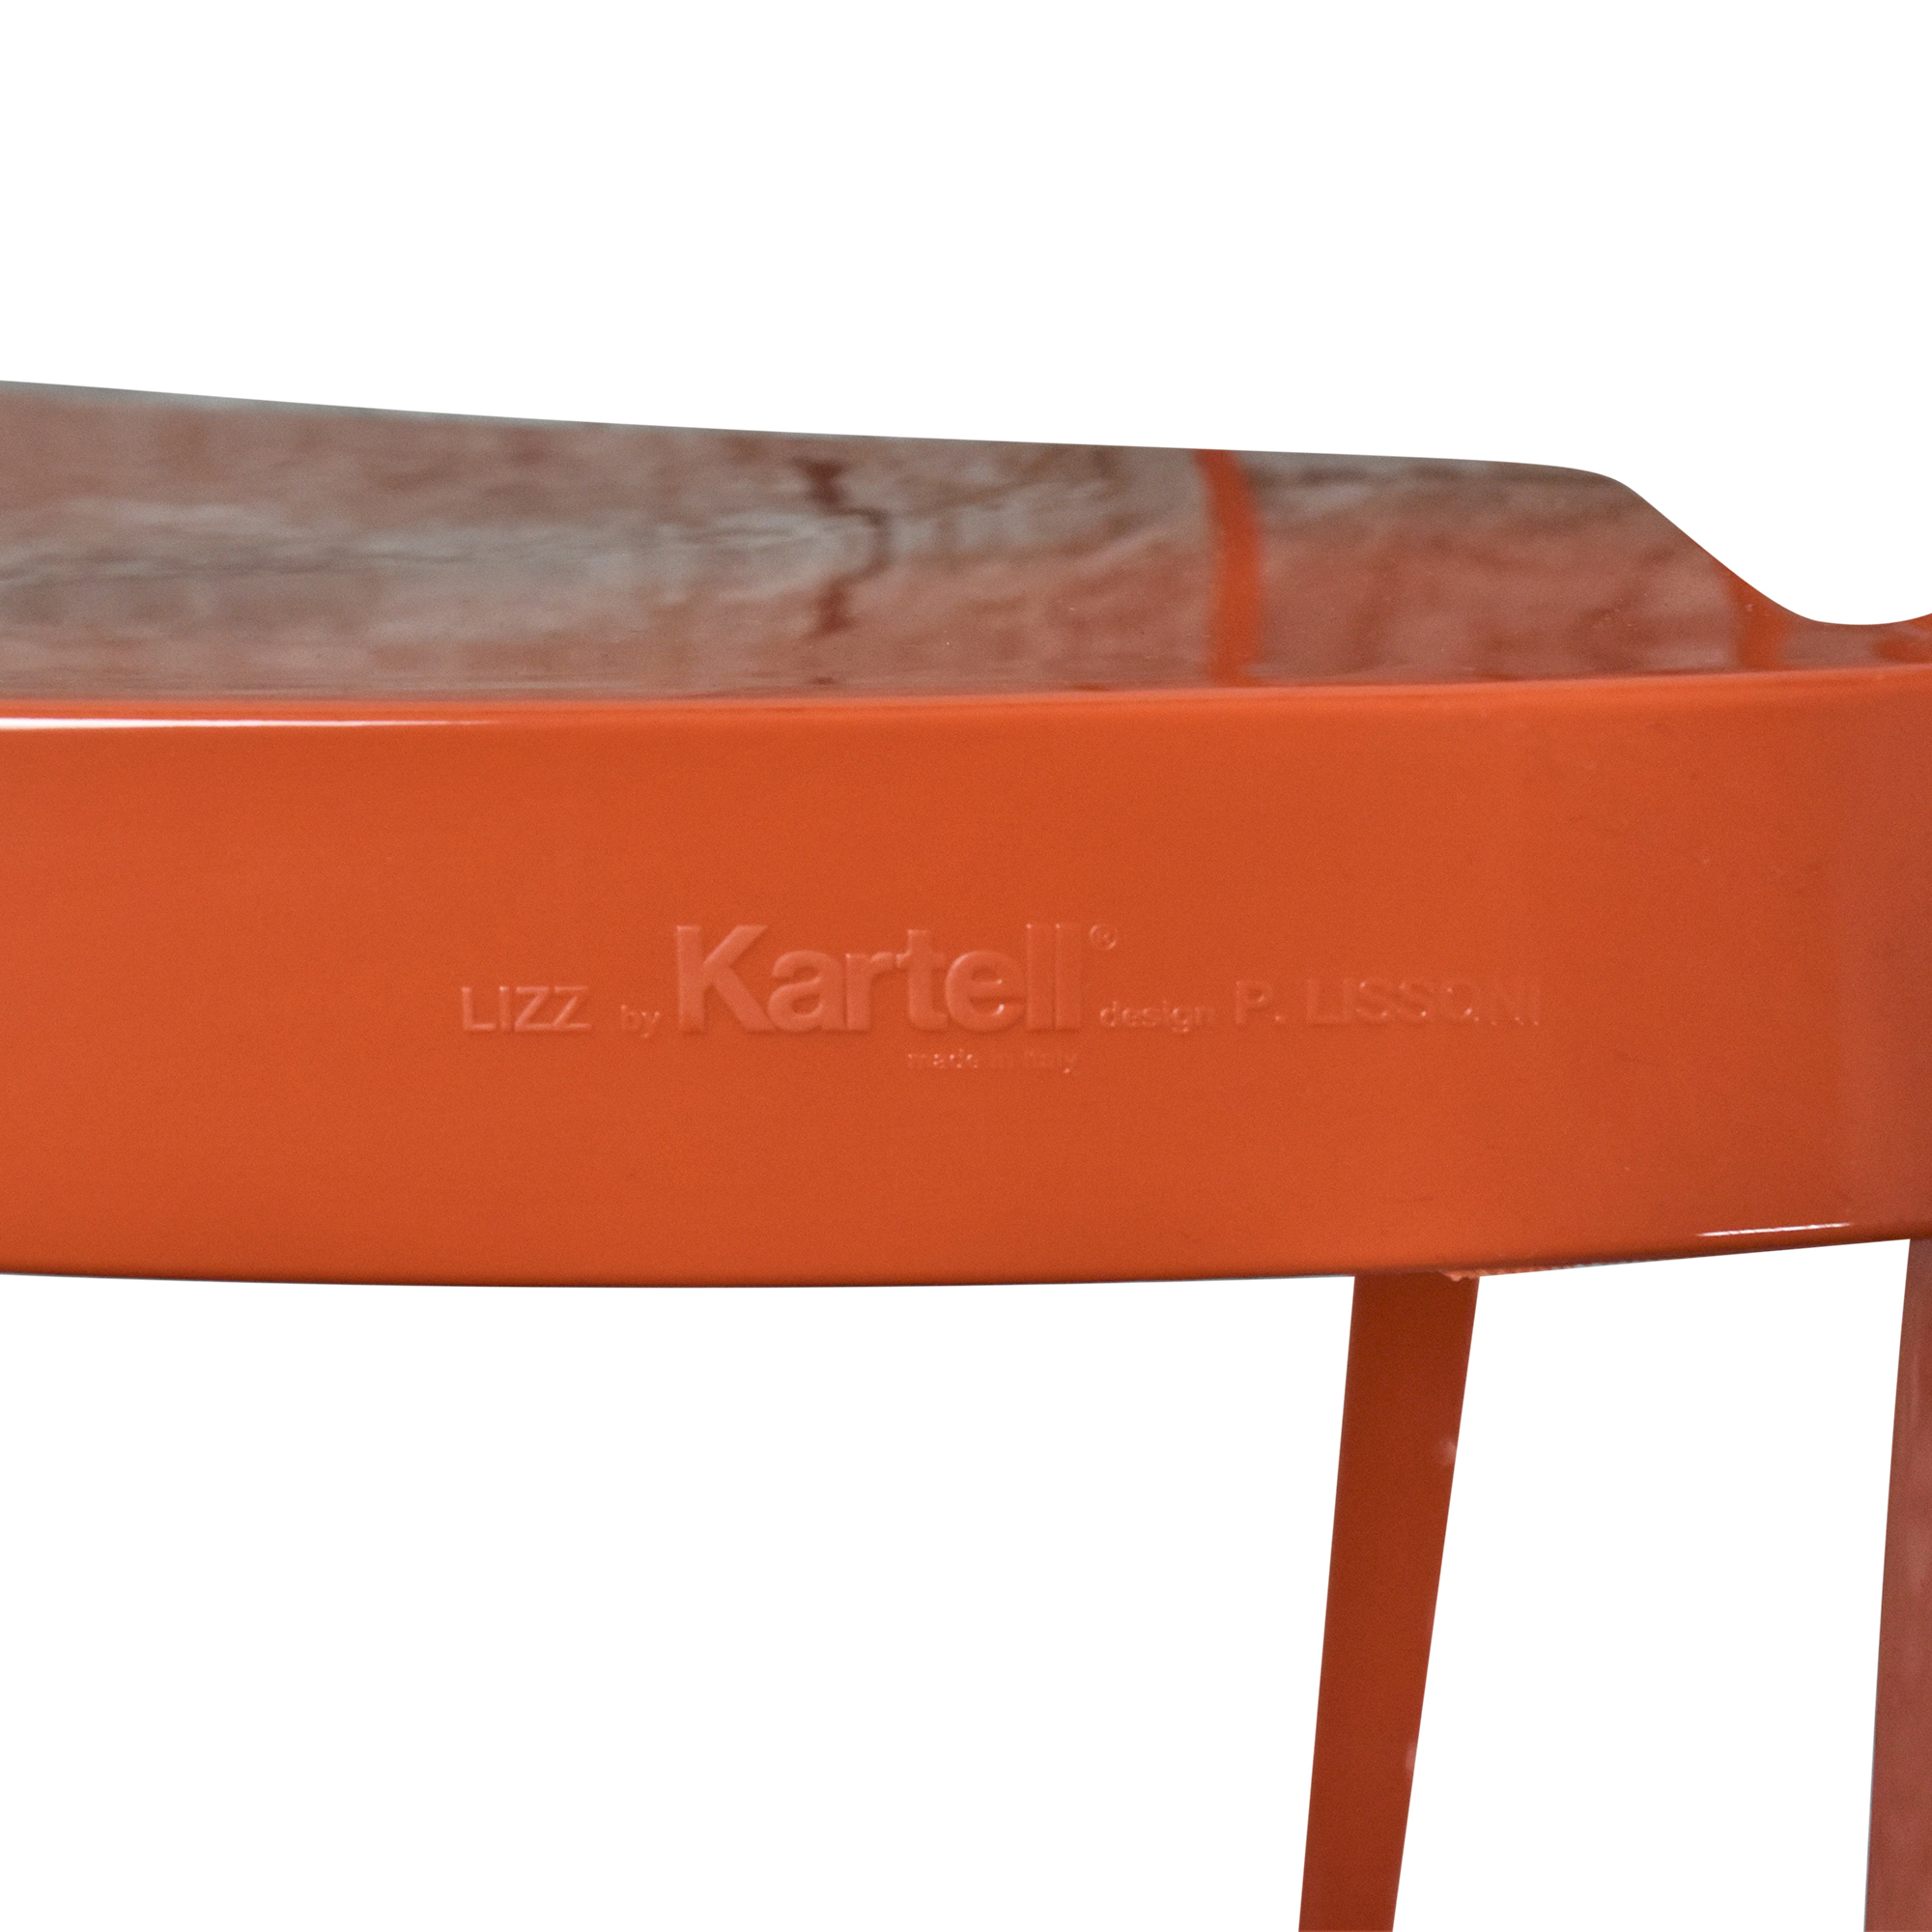 Kartell Kartell Lizz Chairs